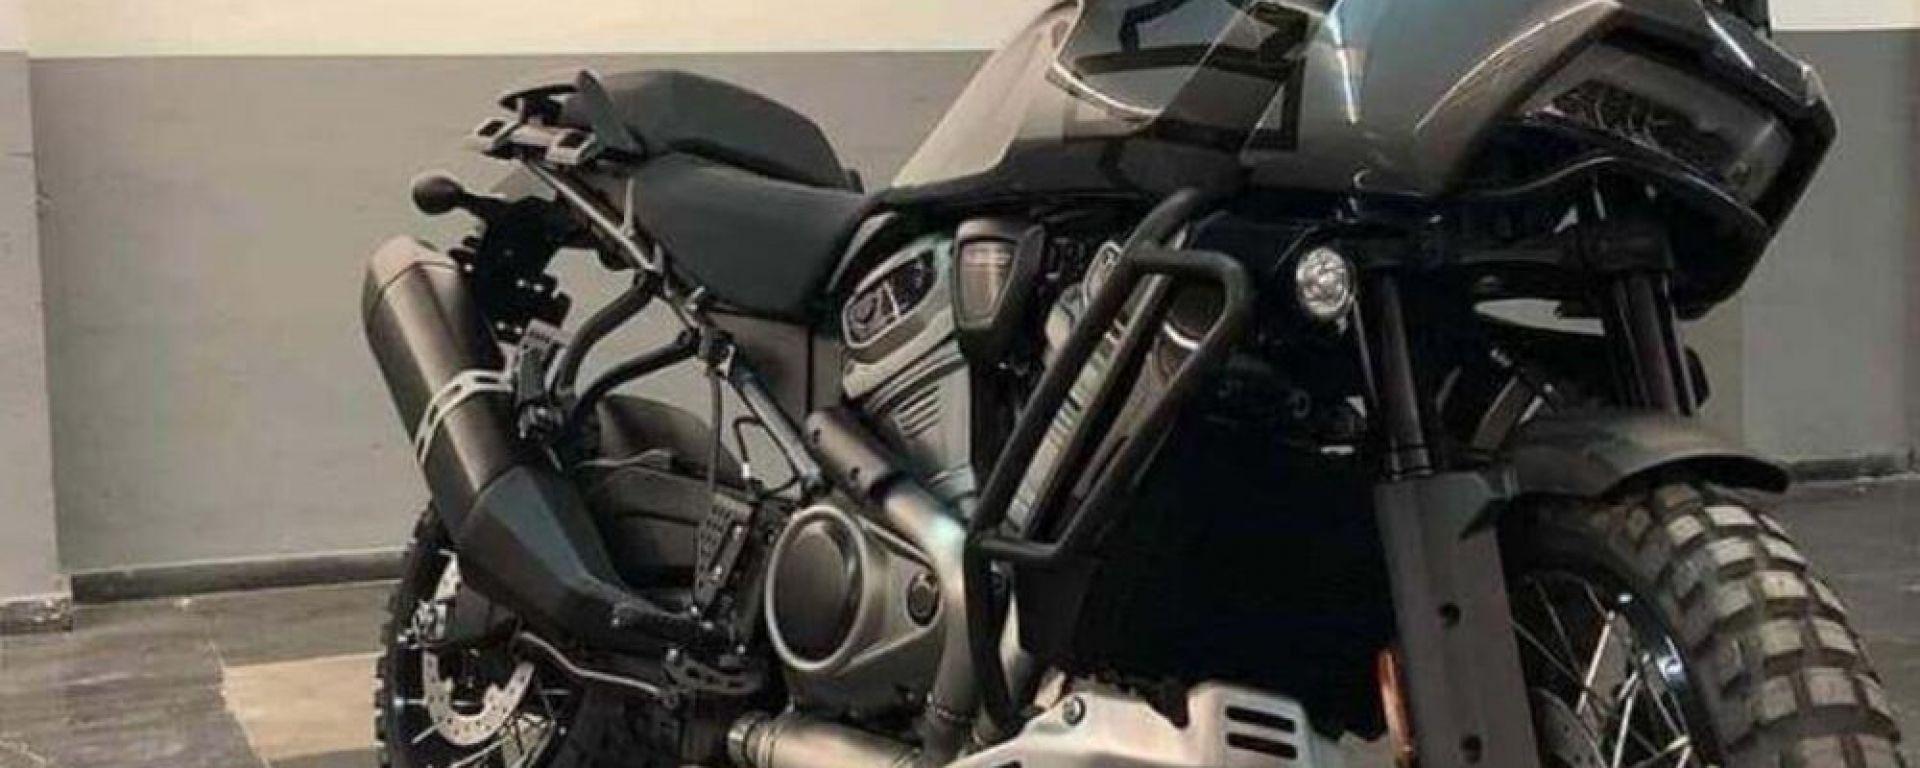 Harley-Davidson: la Pan America è già in Europa. Foto e rumors